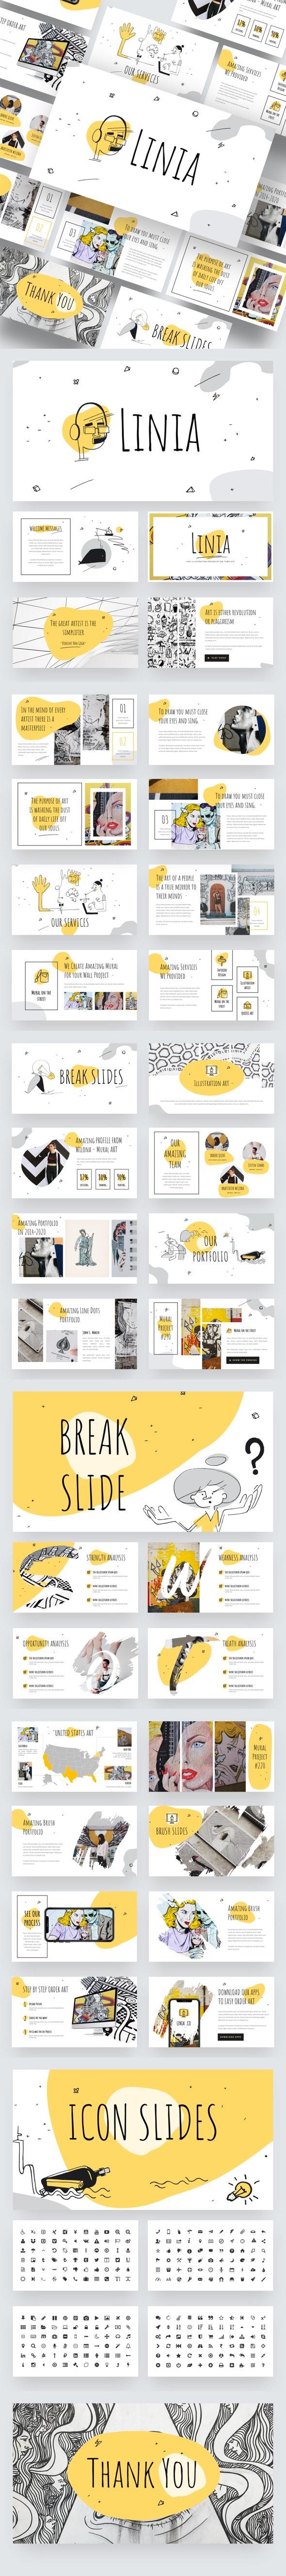 LINIA - Line Illustration Powerpoint Template - Creative PowerPoint Templates